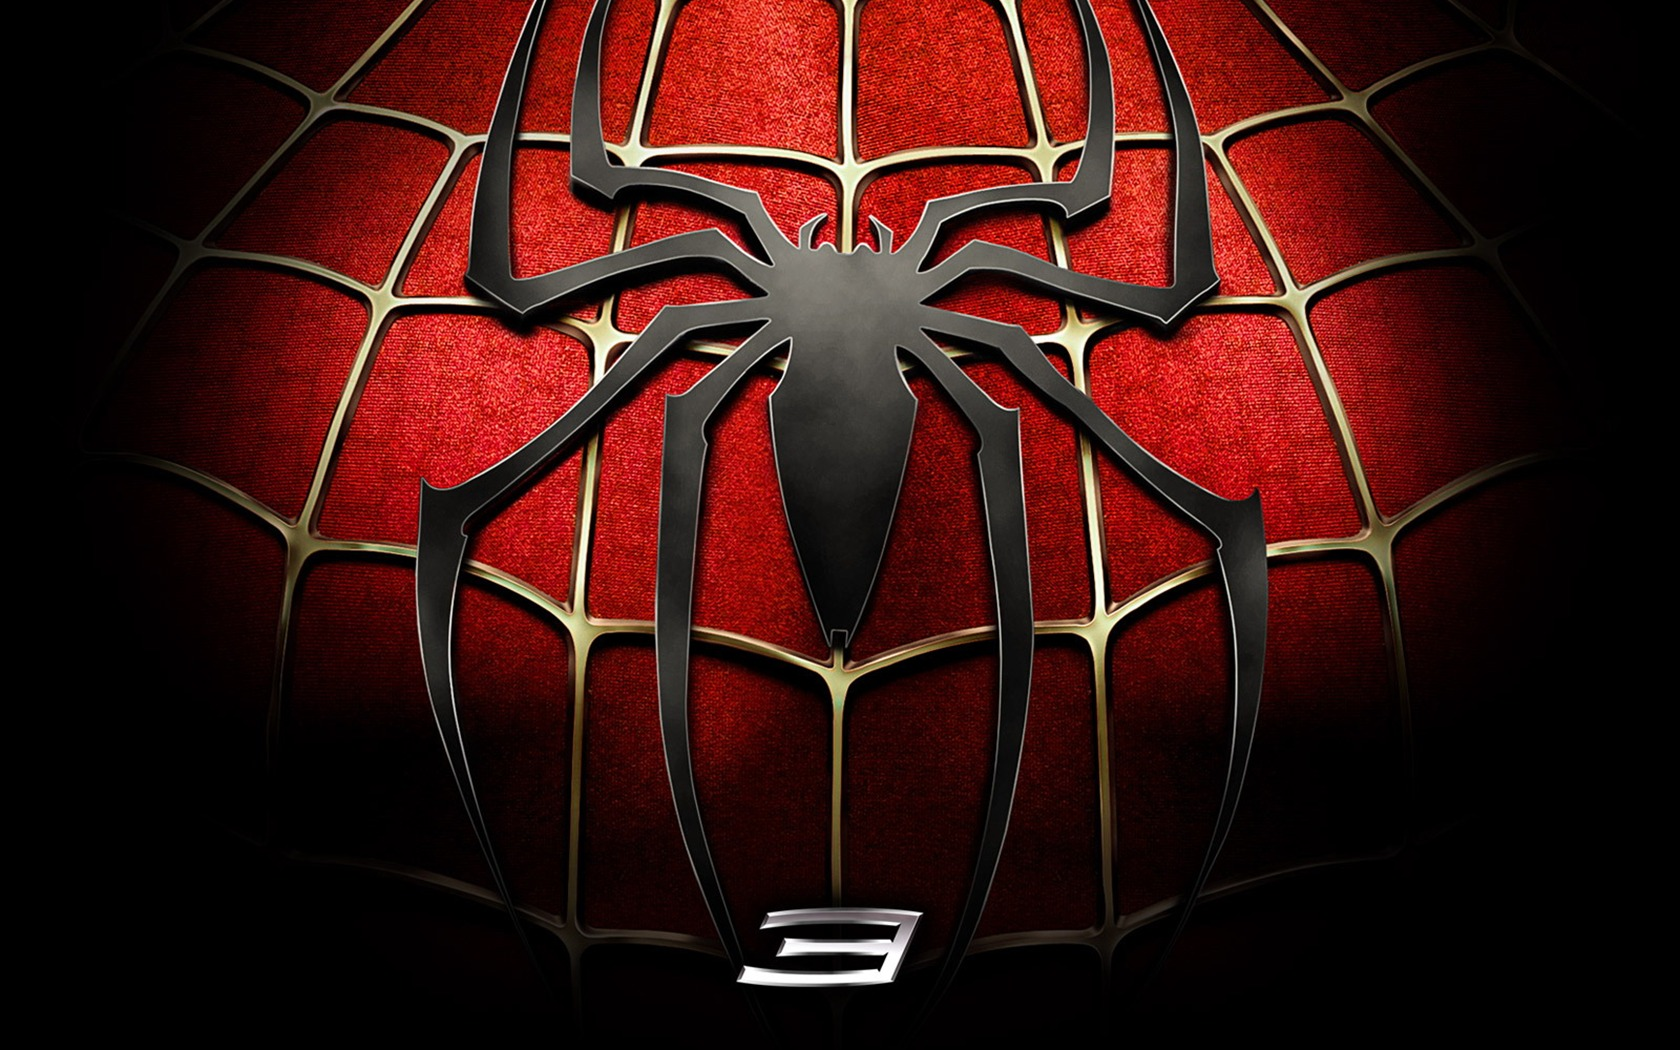 Spiderman 3 Wallpaper 16 1680x1050 Wallpaper Download